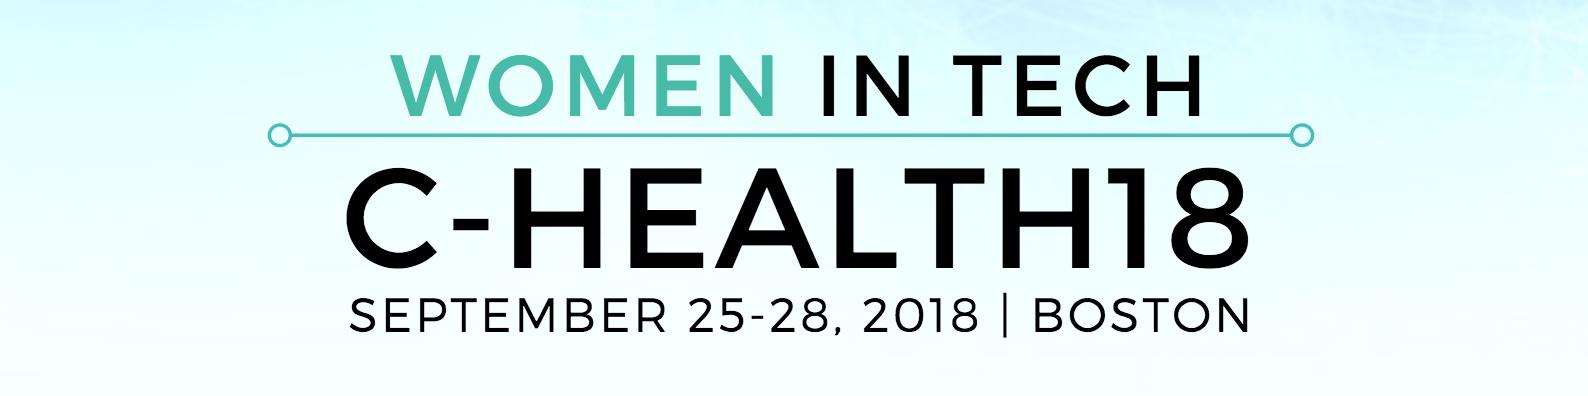 Women in Tech at C-Health18